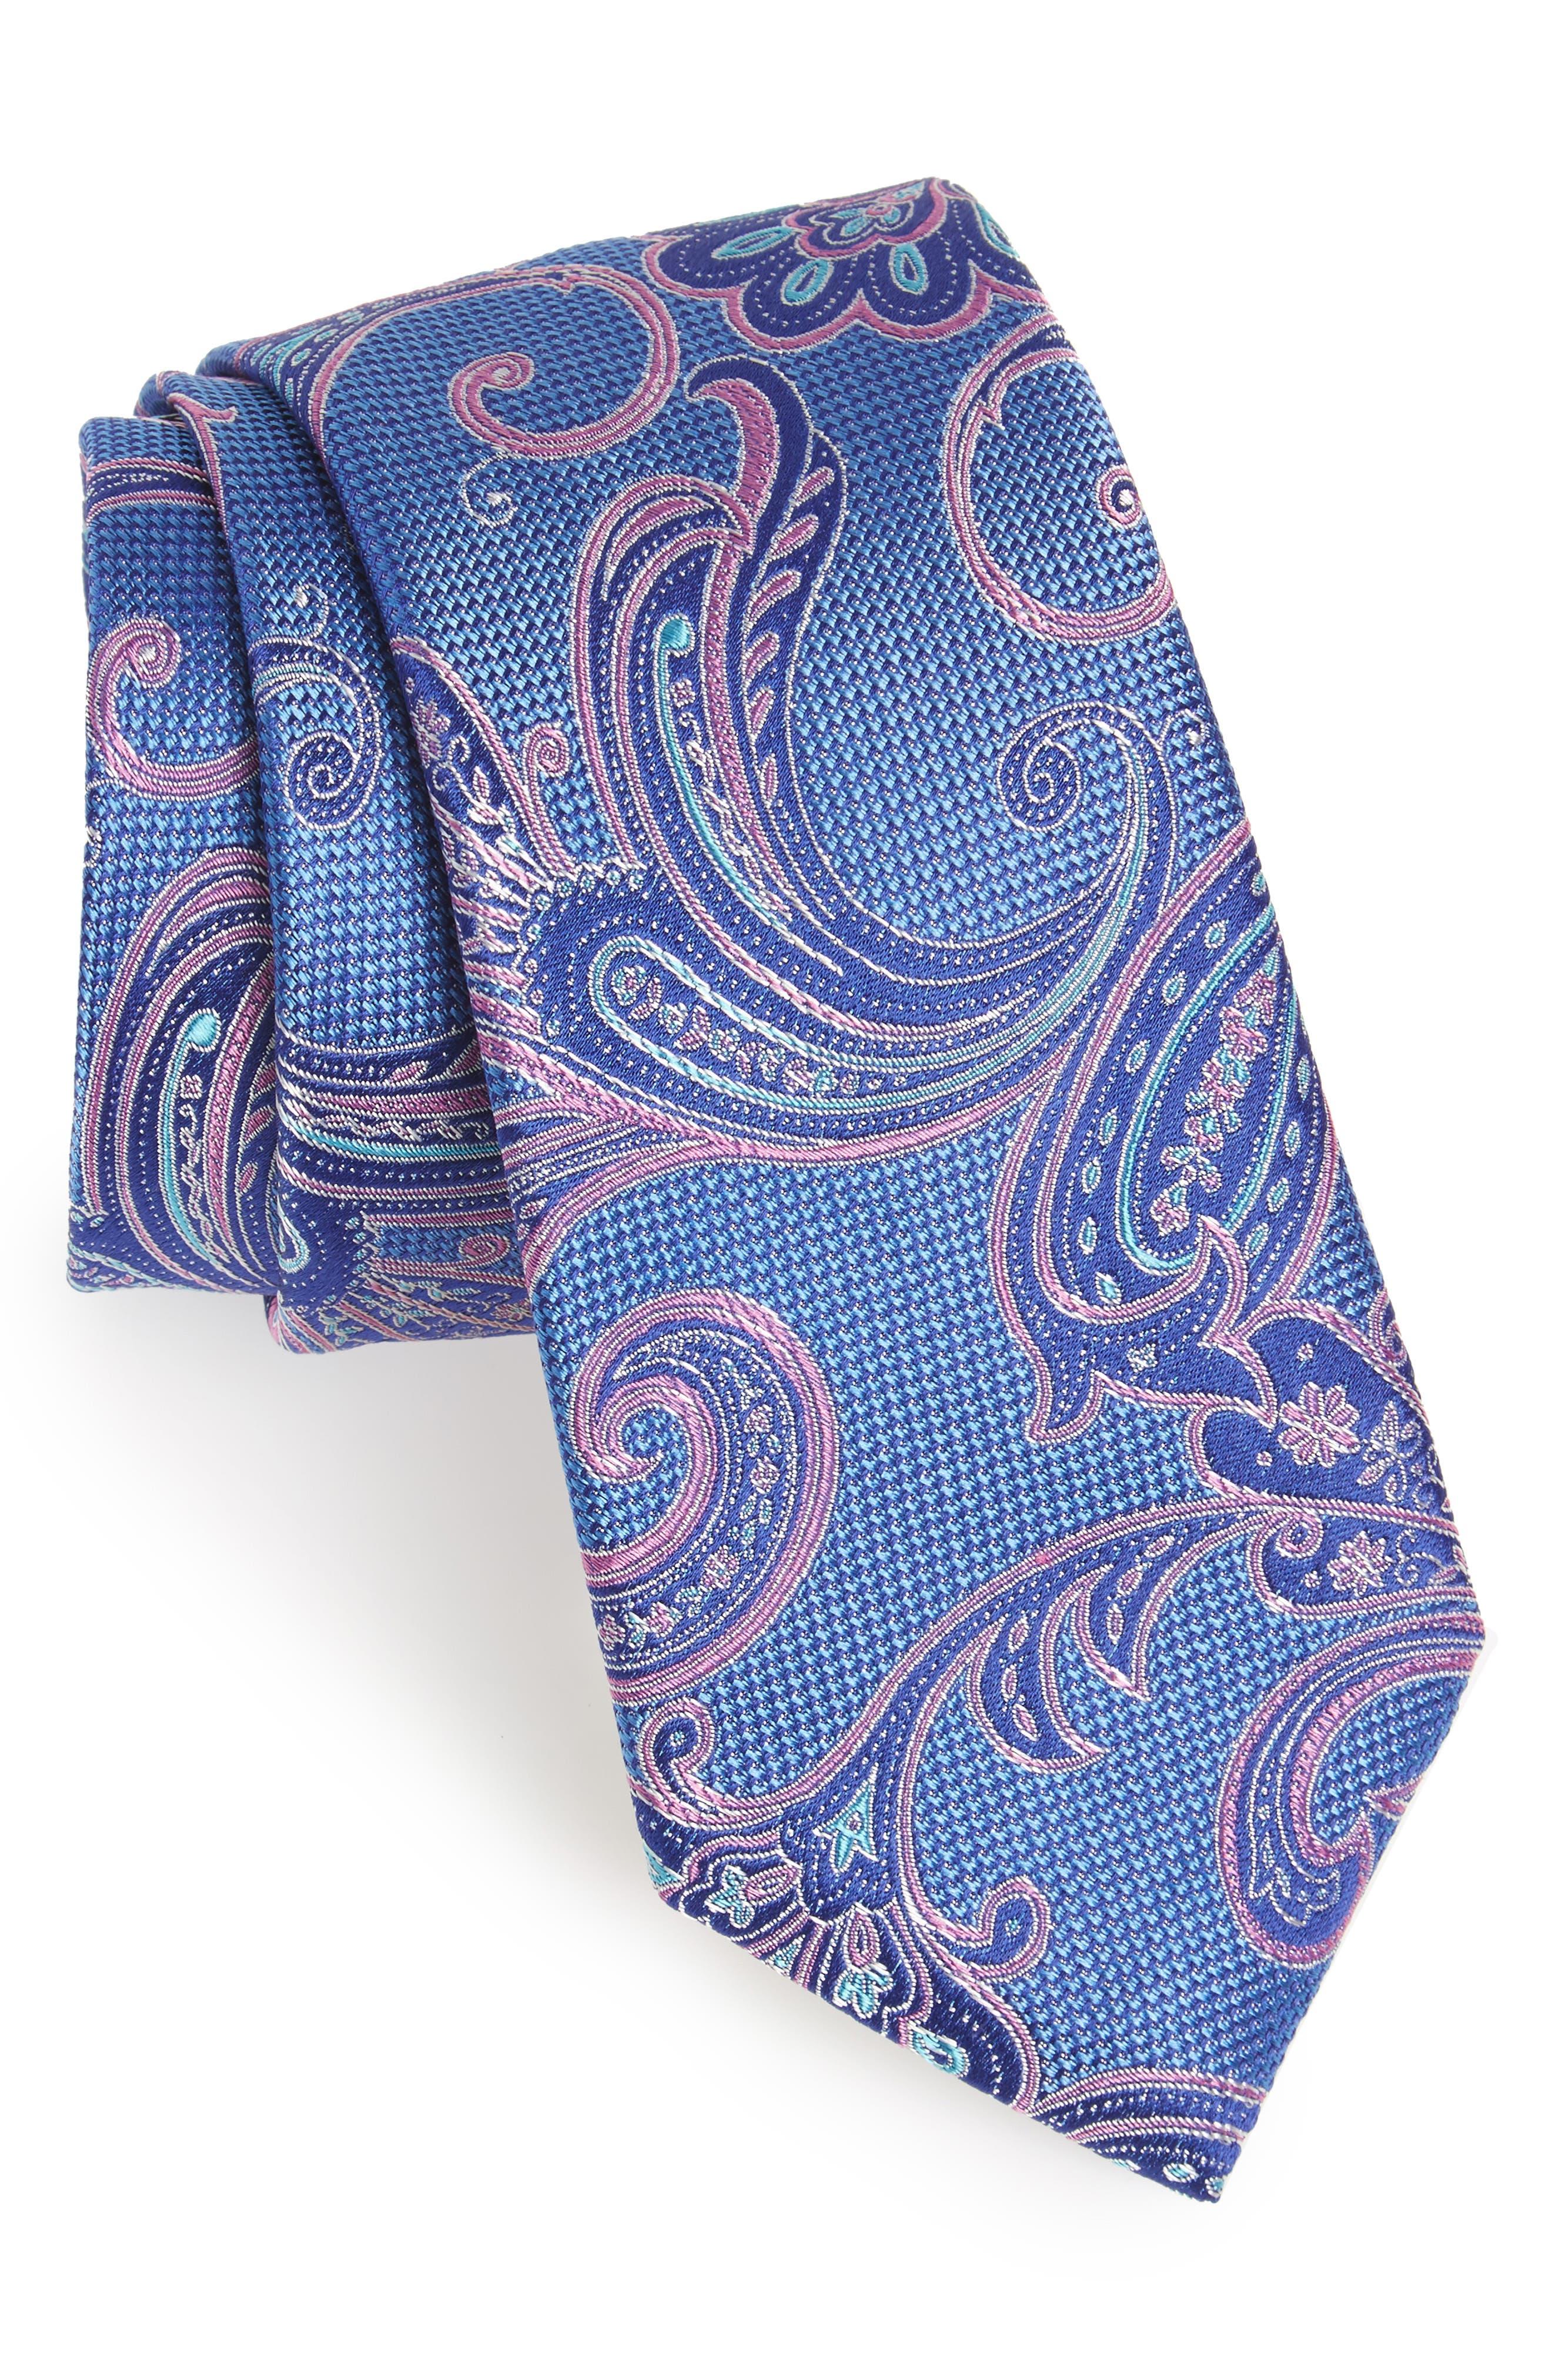 Bennett Paisley Silk Tie,                             Main thumbnail 1, color,                             OCEAN